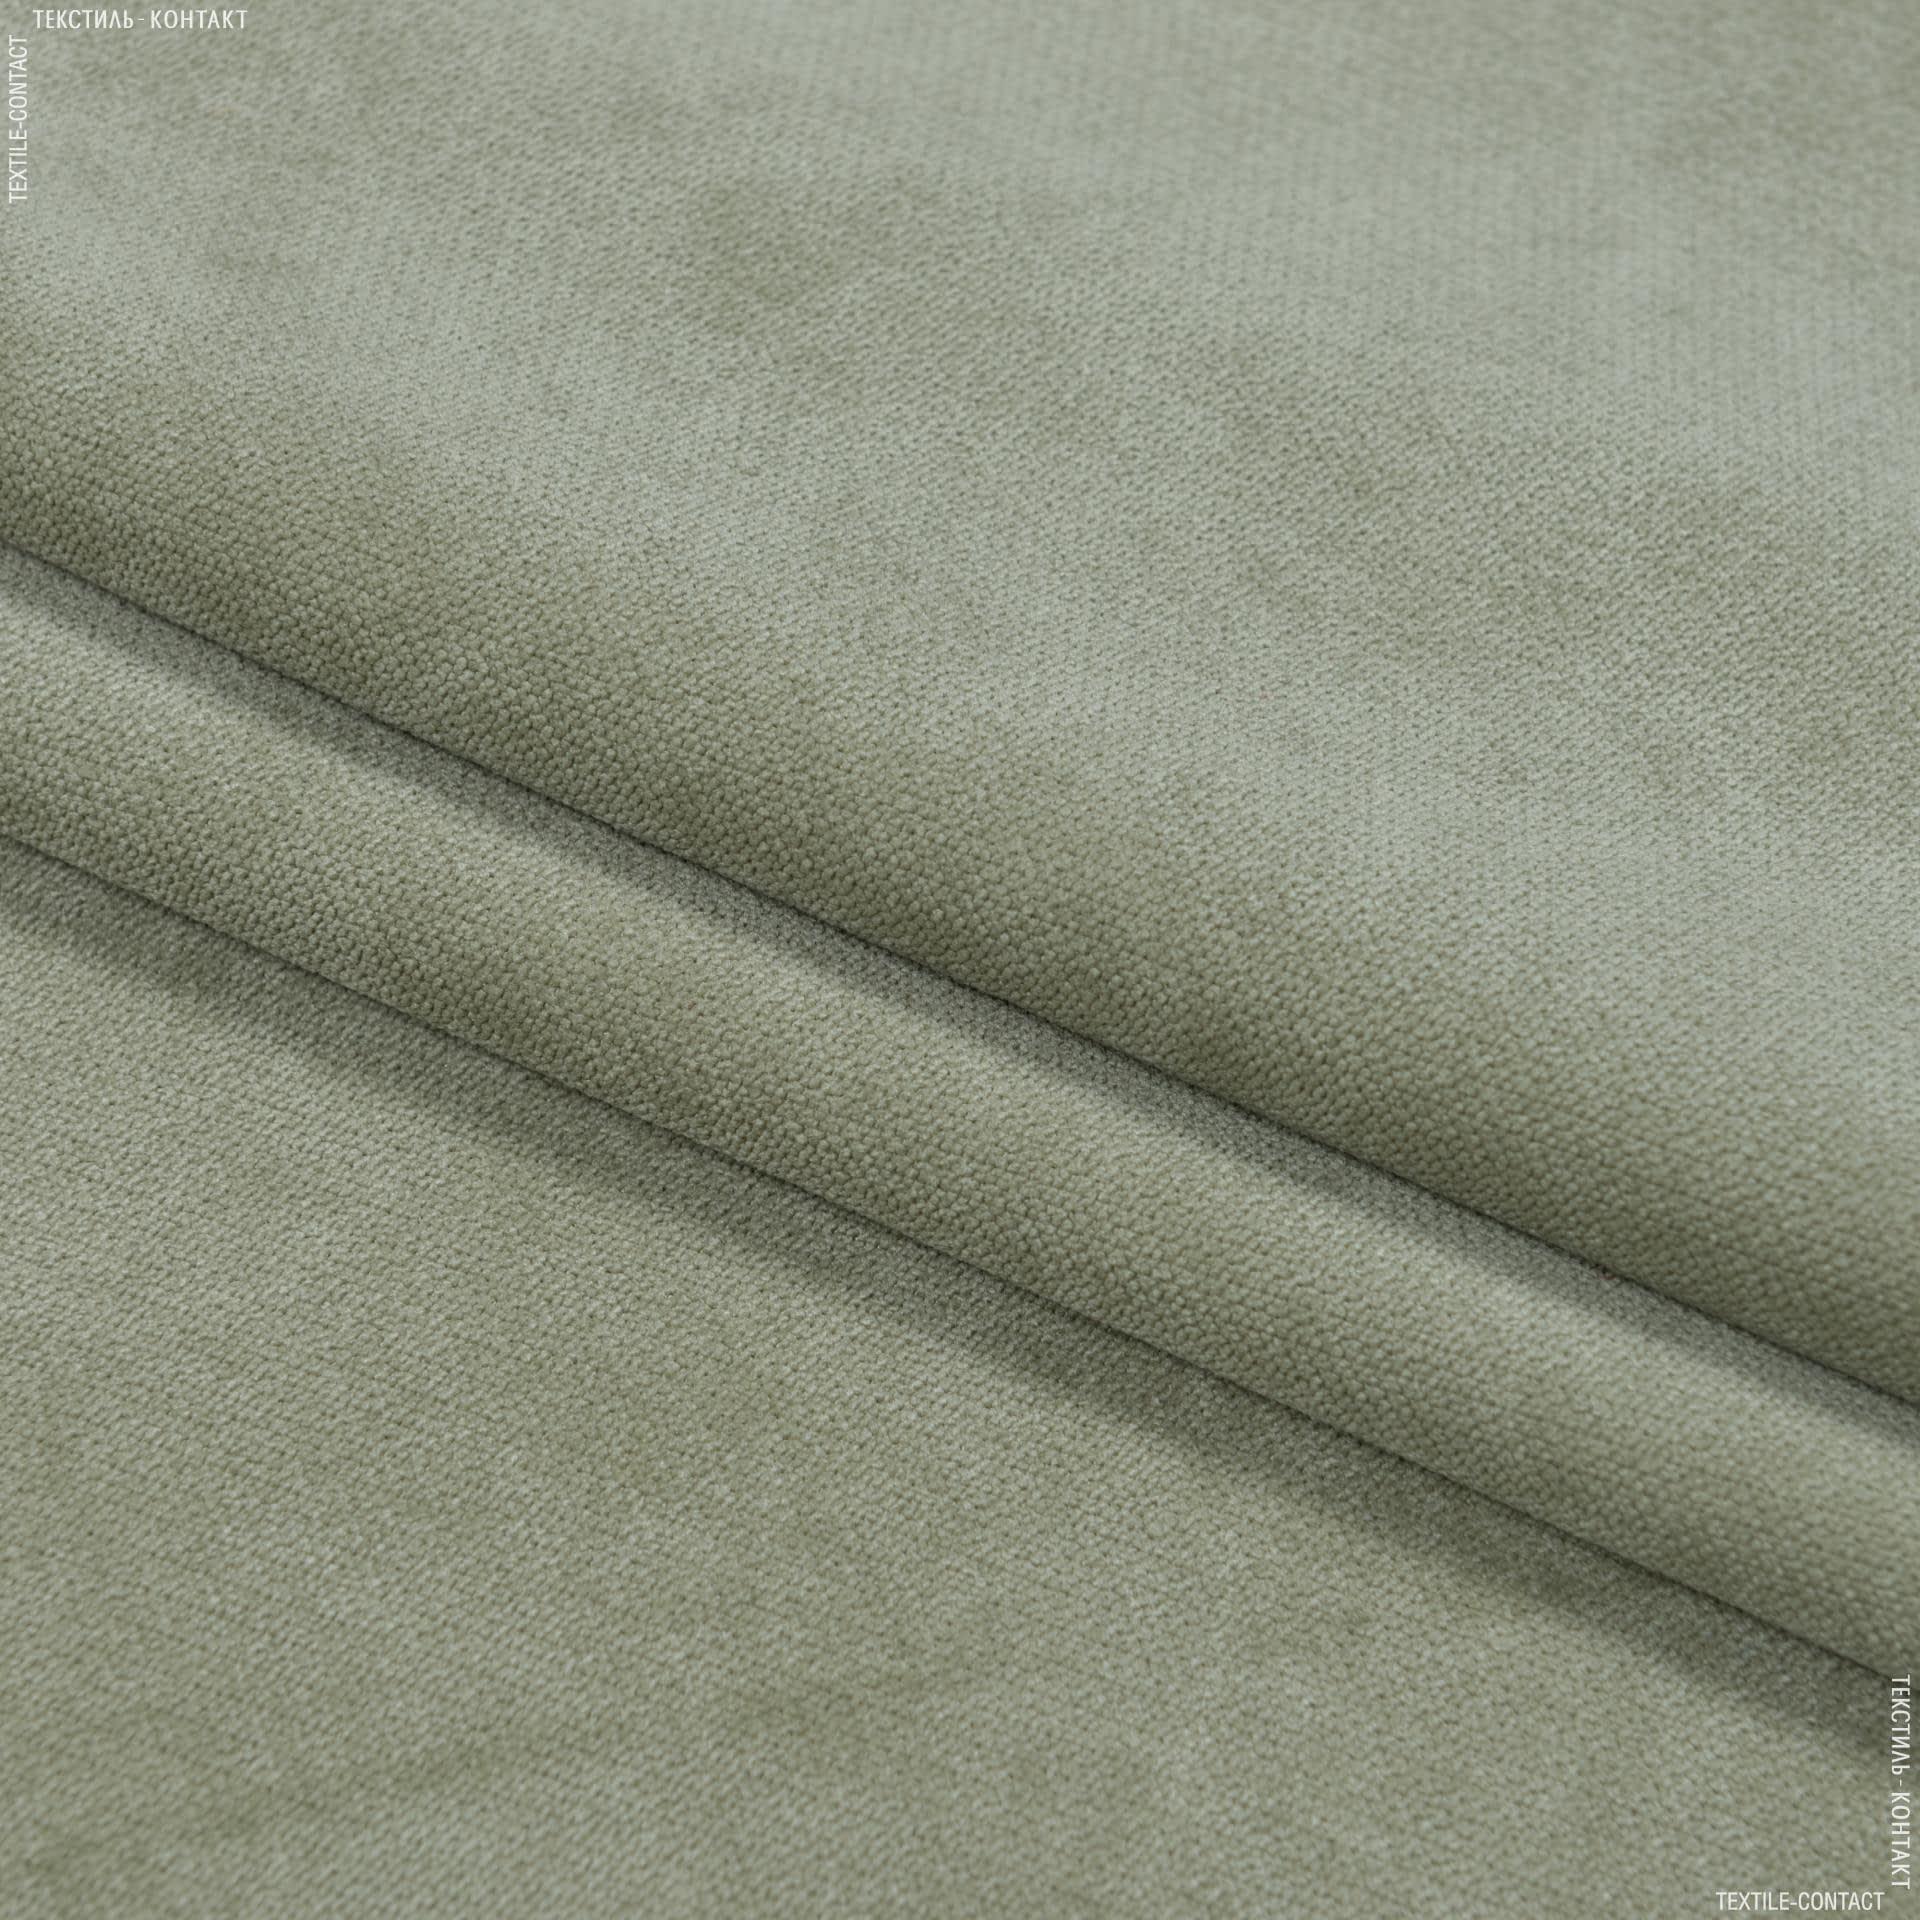 Ткани для мебели - Велюр будапешт/budapest оливка